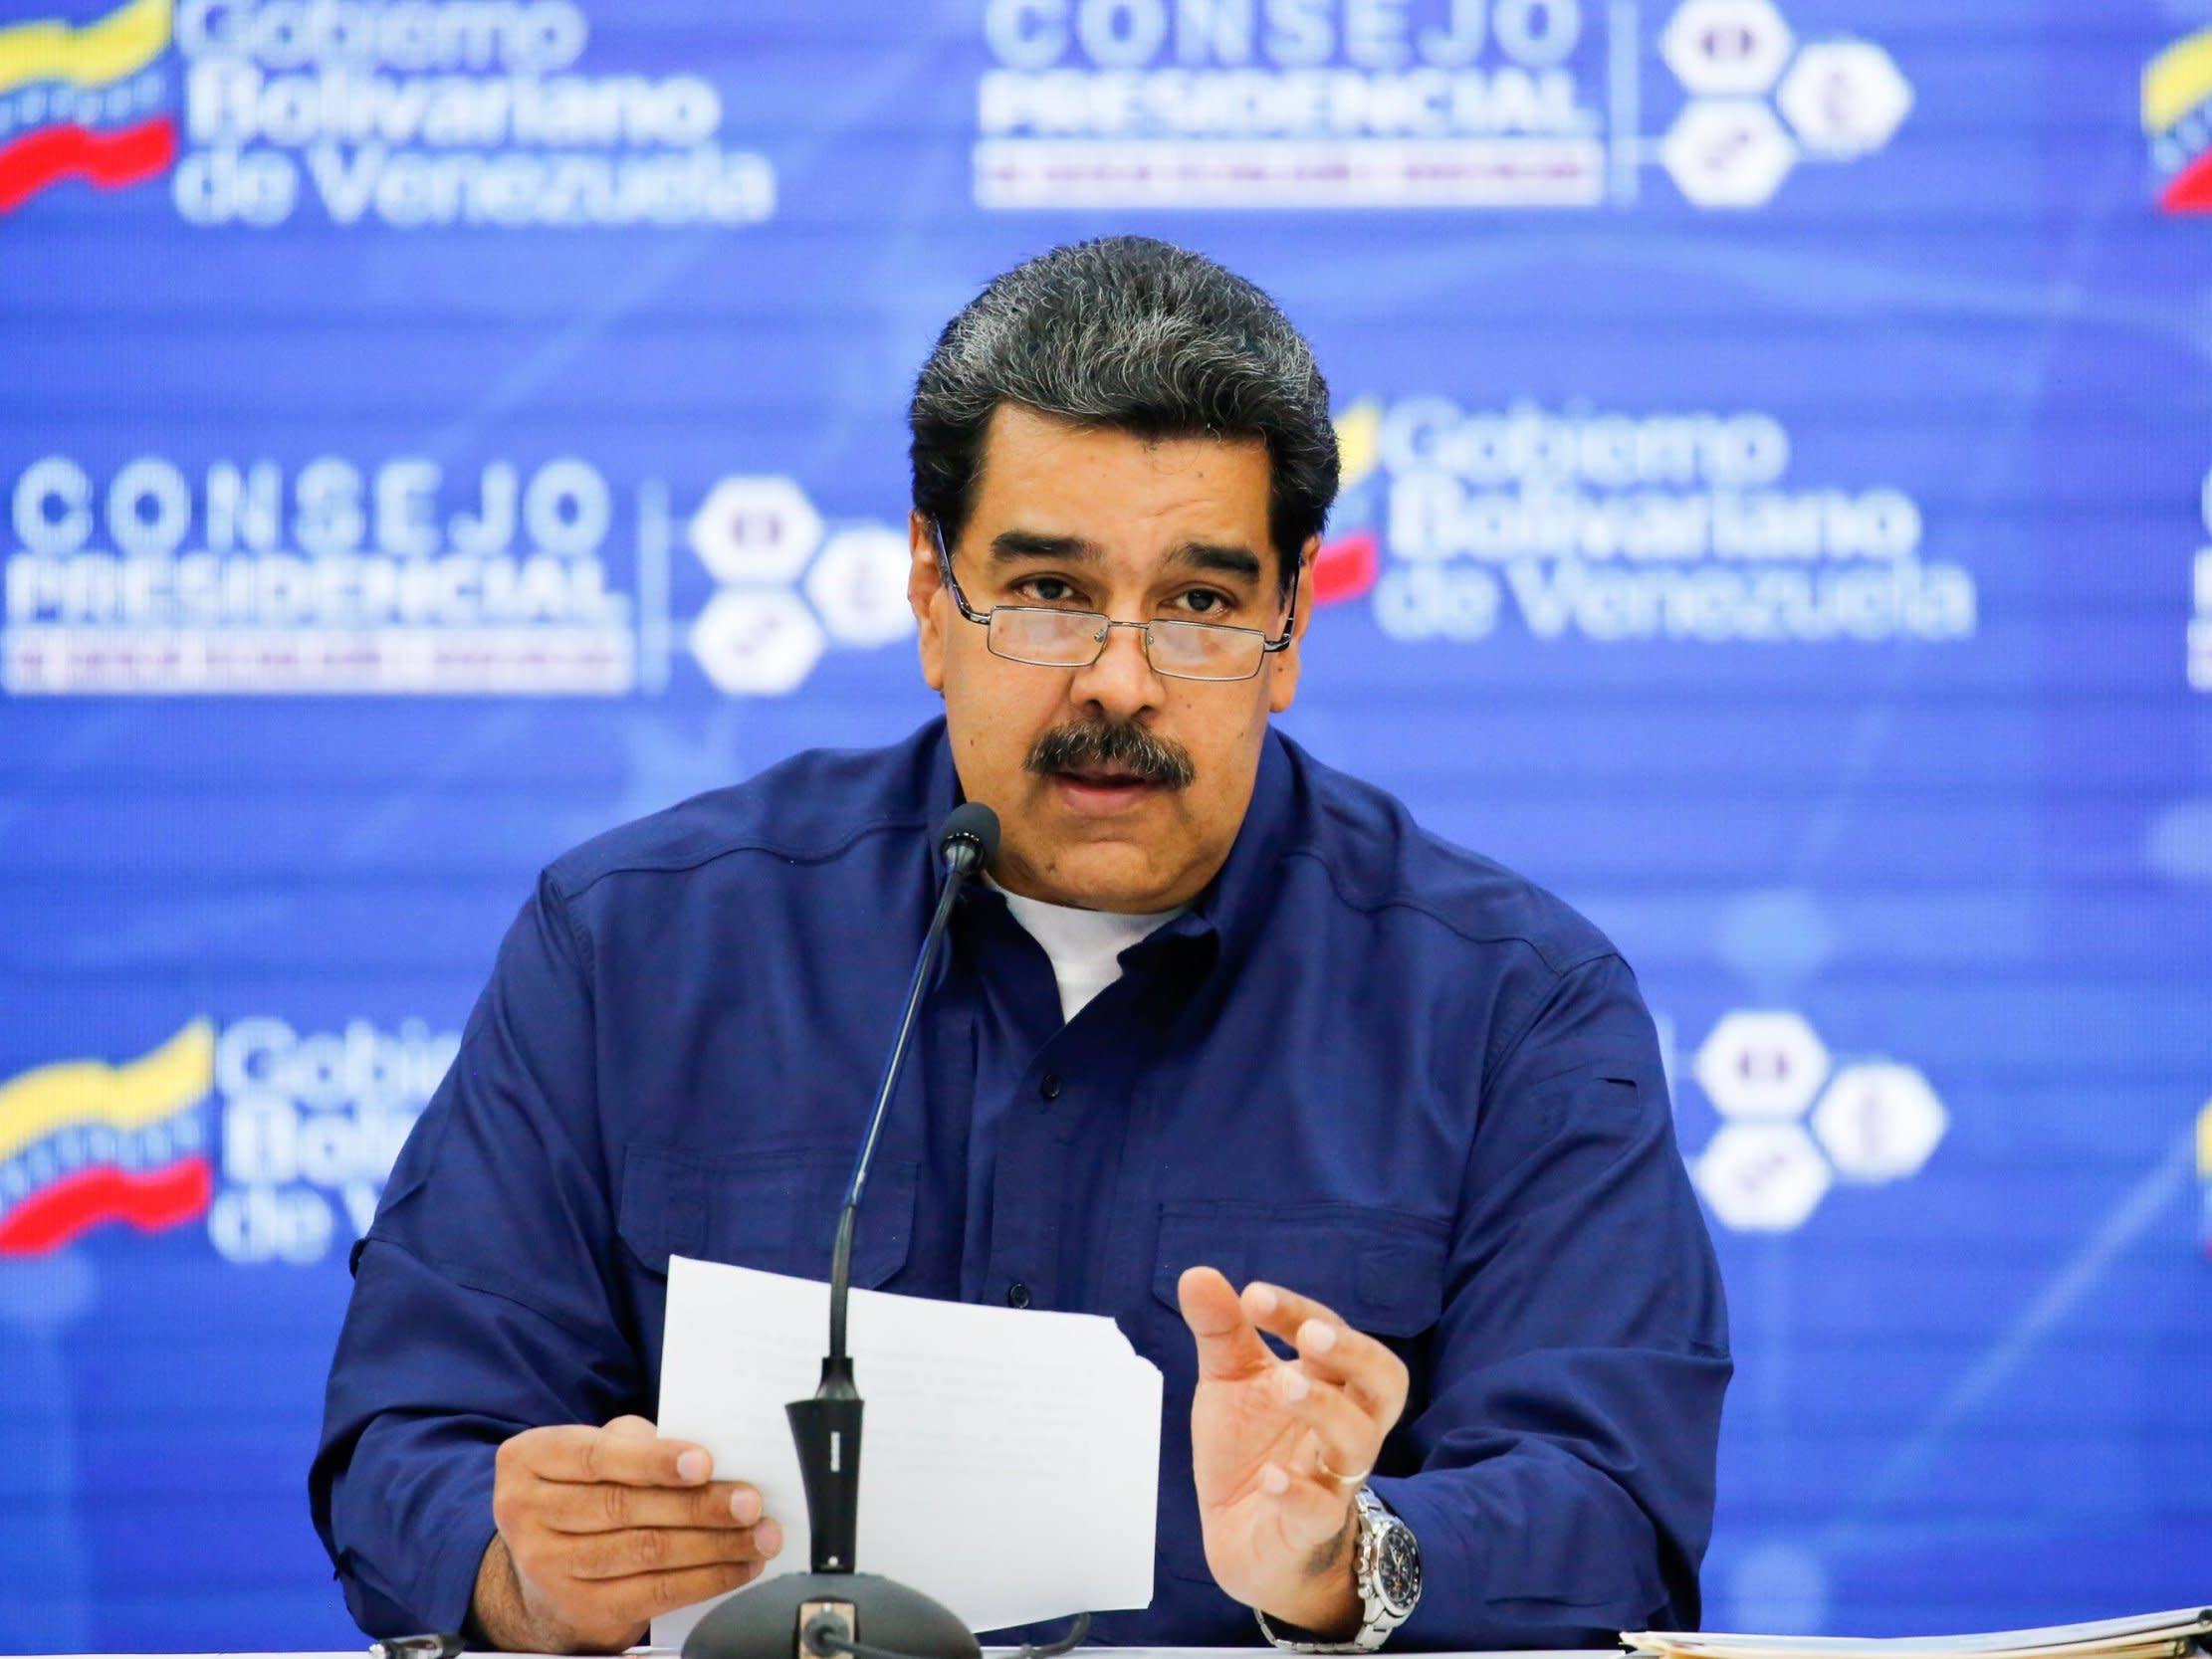 Nicolas Maduro attacks Trump's 'almost Nazi-style' speech after US president calls on military to abandon Venezuela leader